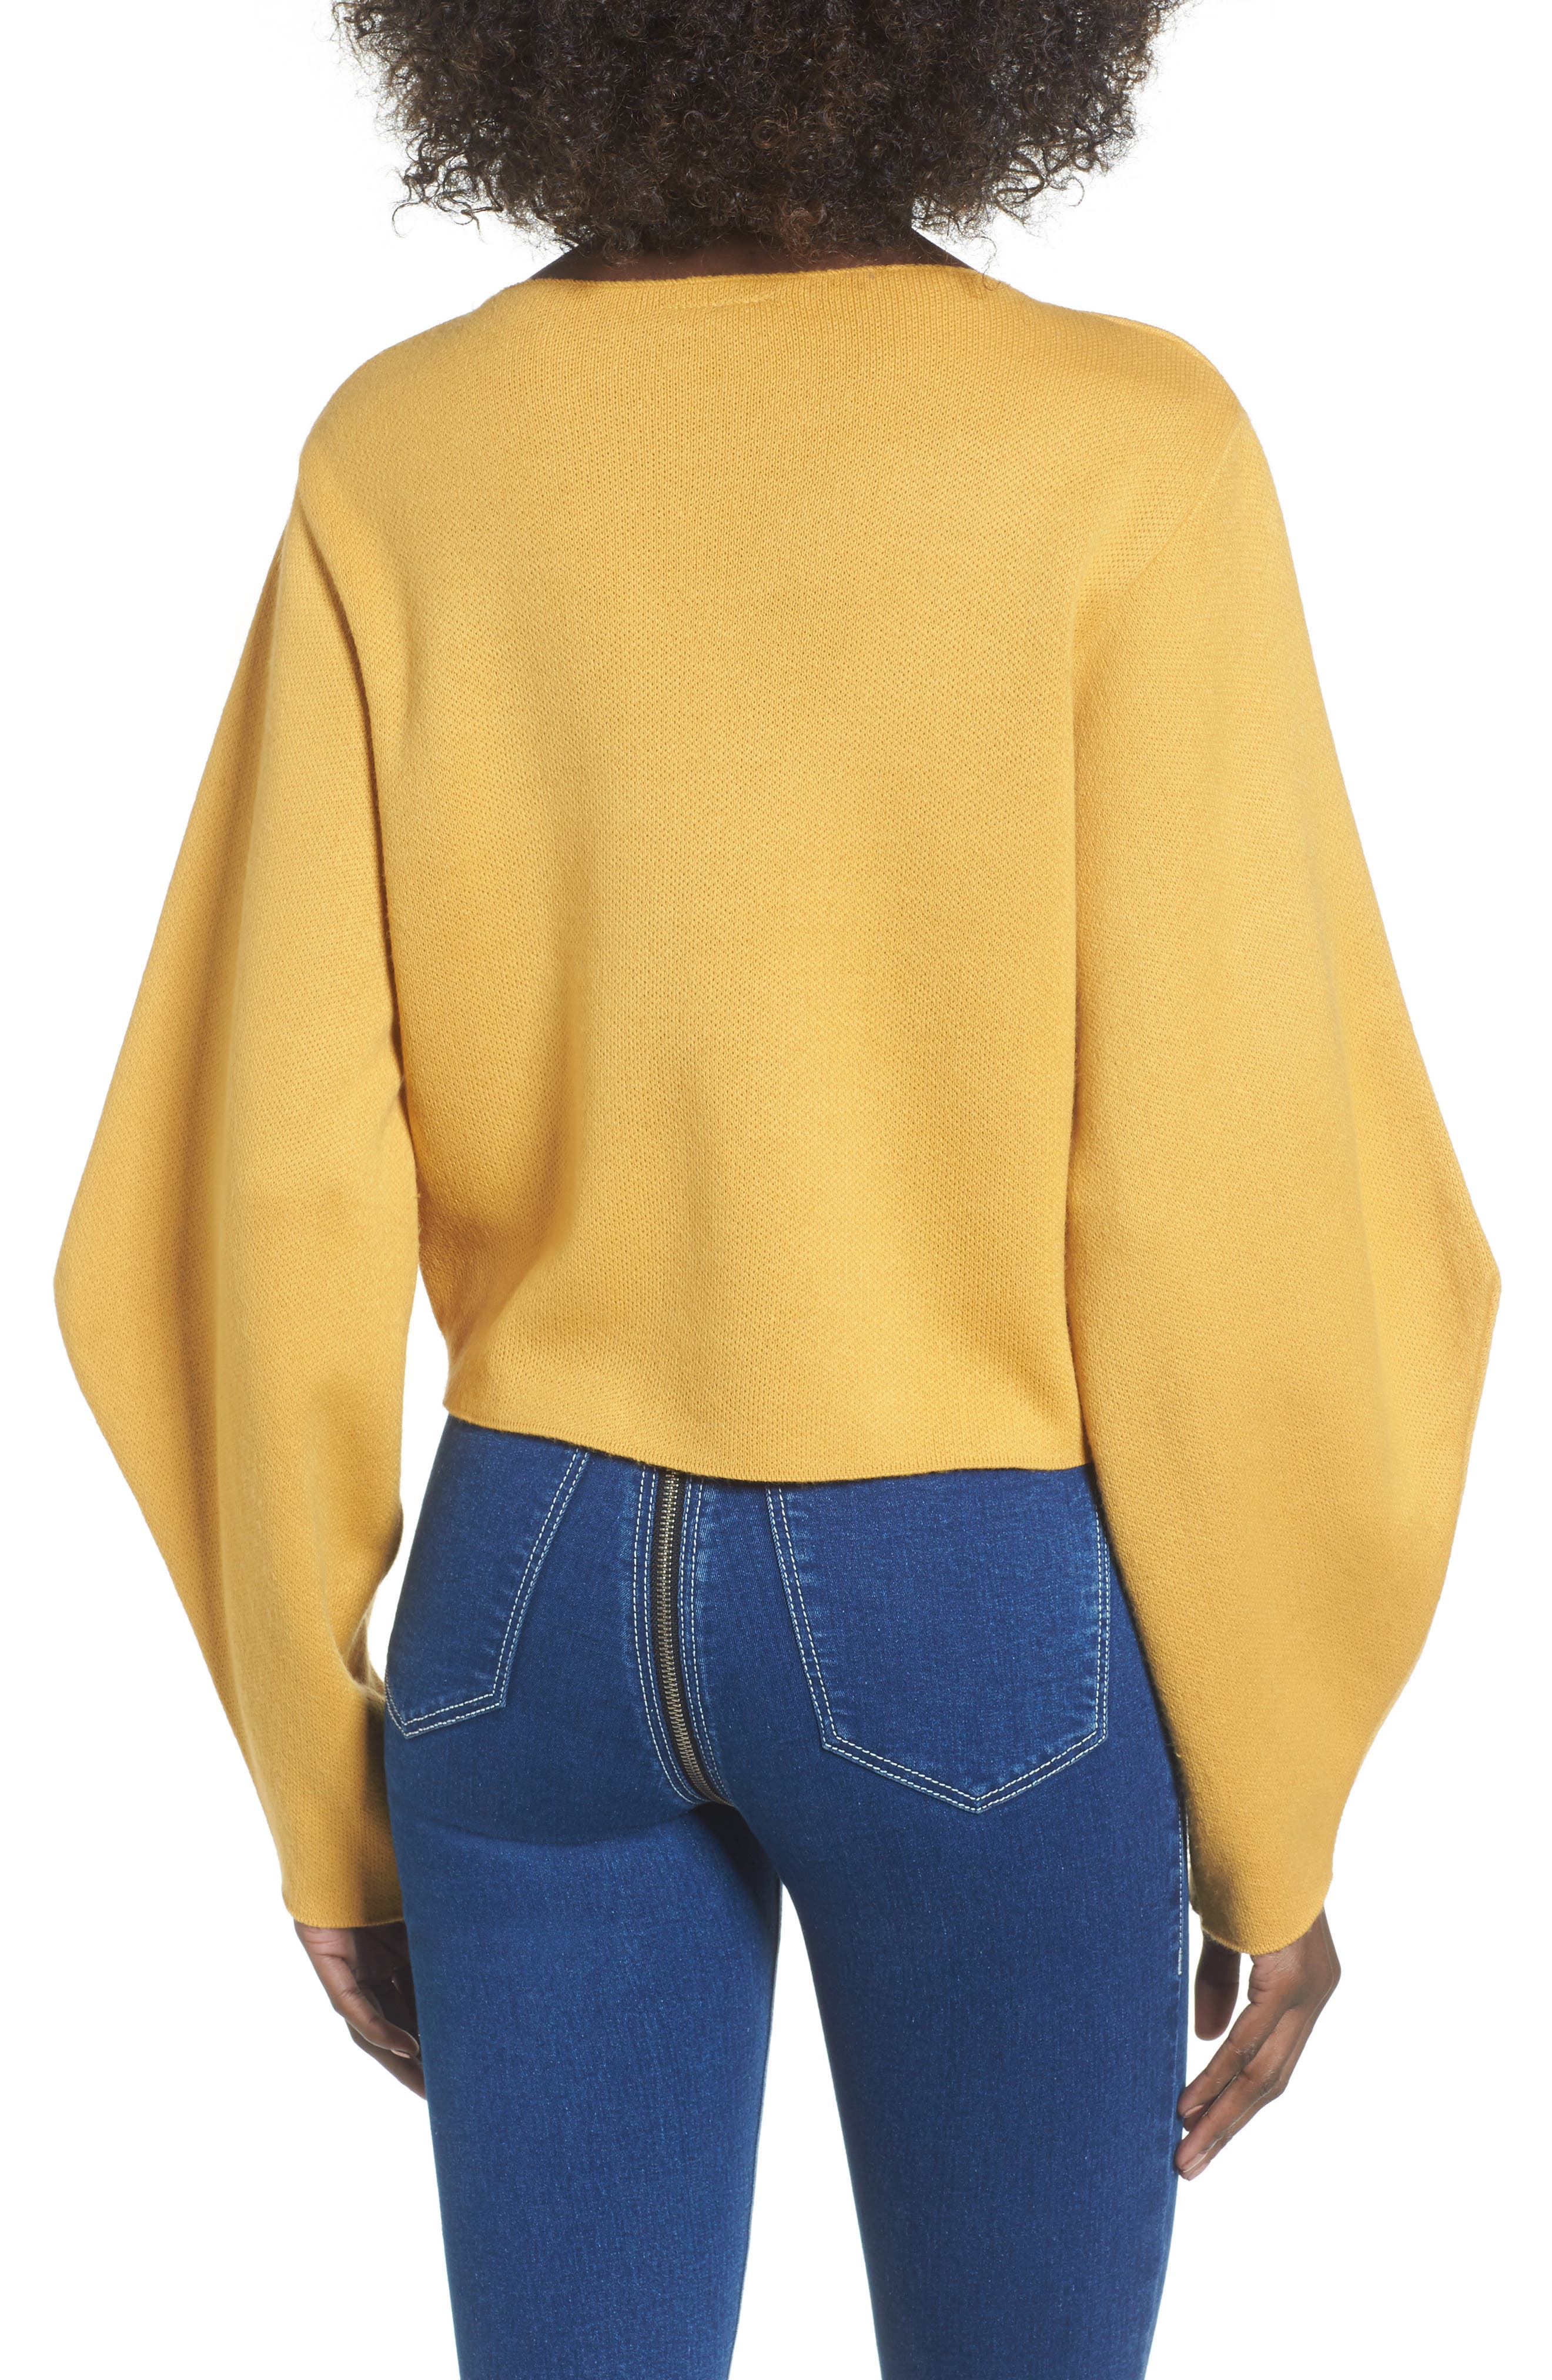 Balloon Sleeve Sweater,                             Alternate thumbnail 2, color,                             700